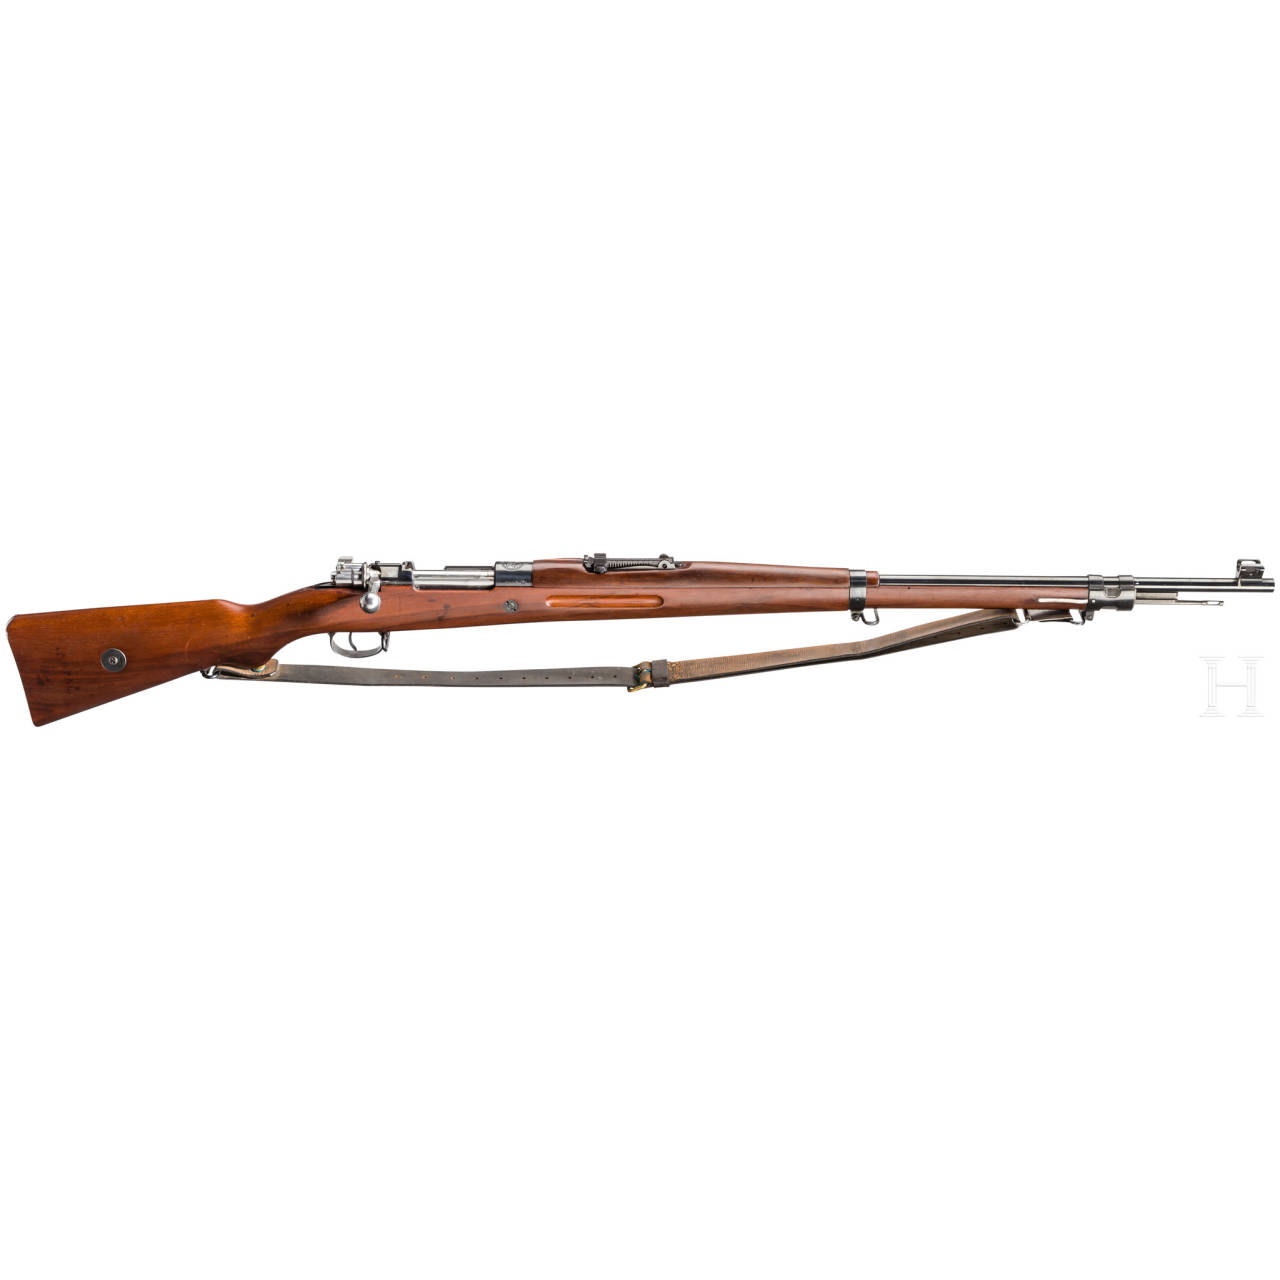 Gewehr 98/29 (pers. Mod. 1310)